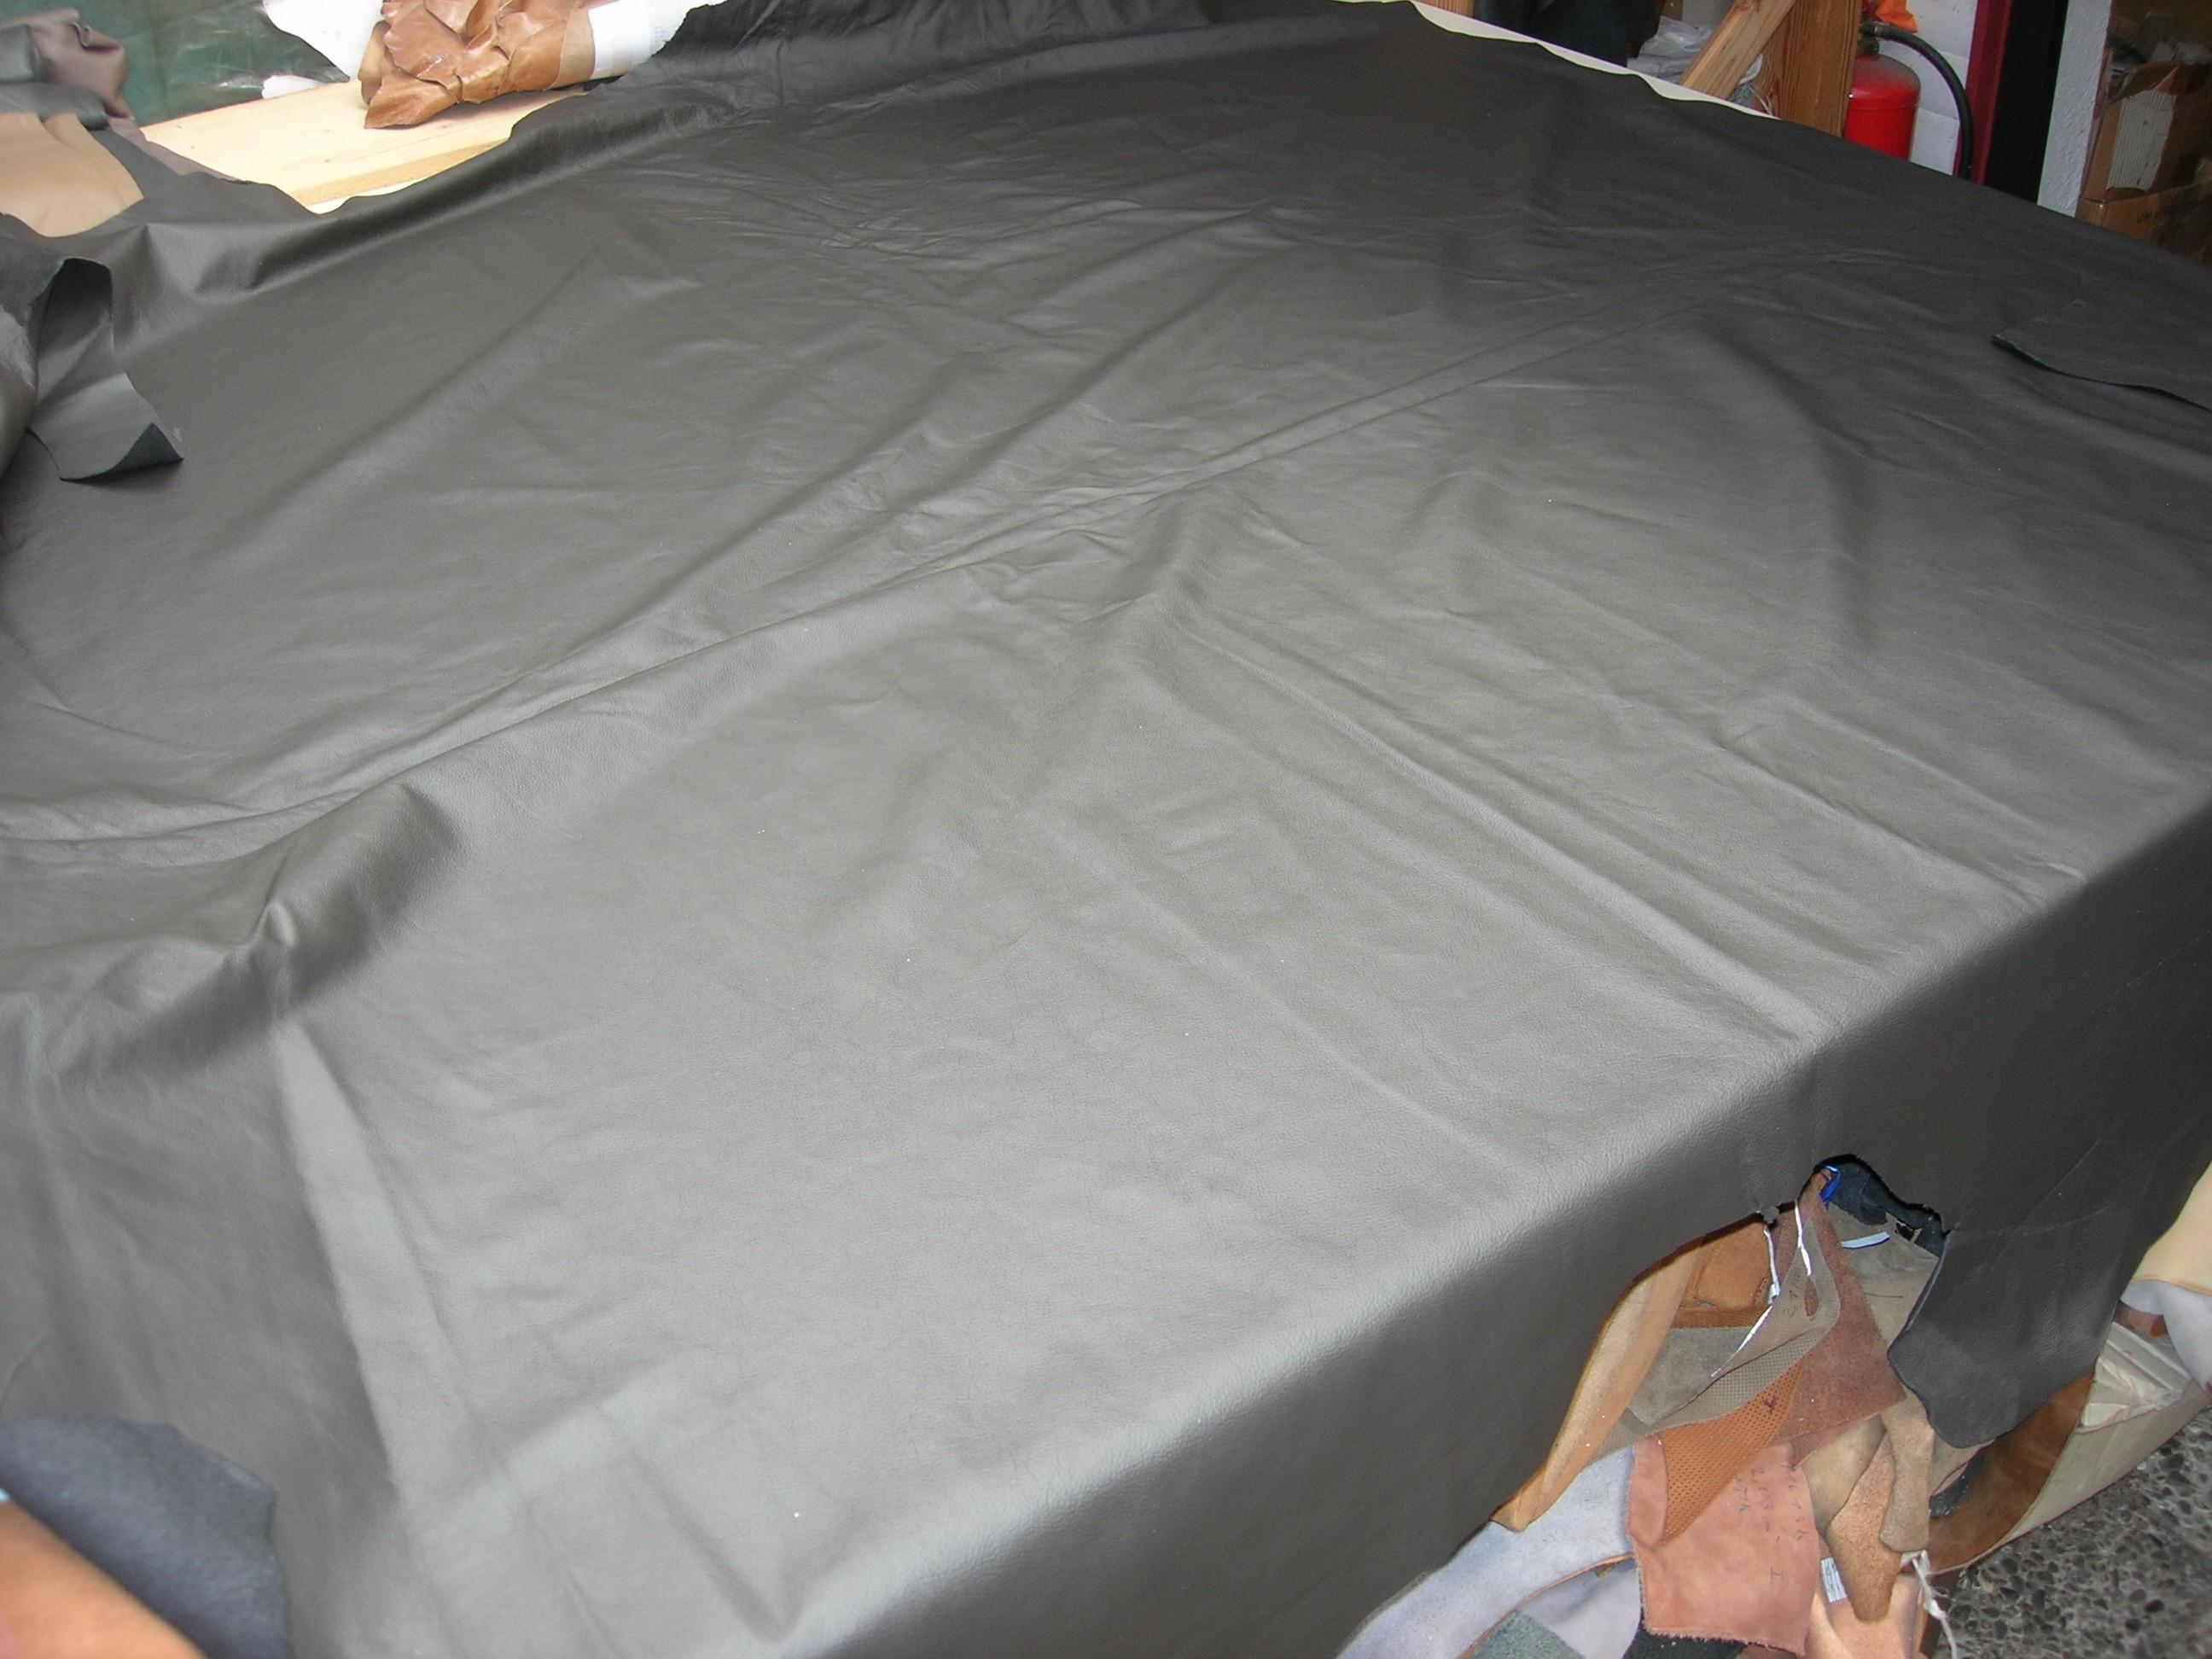 Möbelleder tief dunkelbraun 0,8 mm stark gedeckt (E191150KDB23)  Ausverkauft